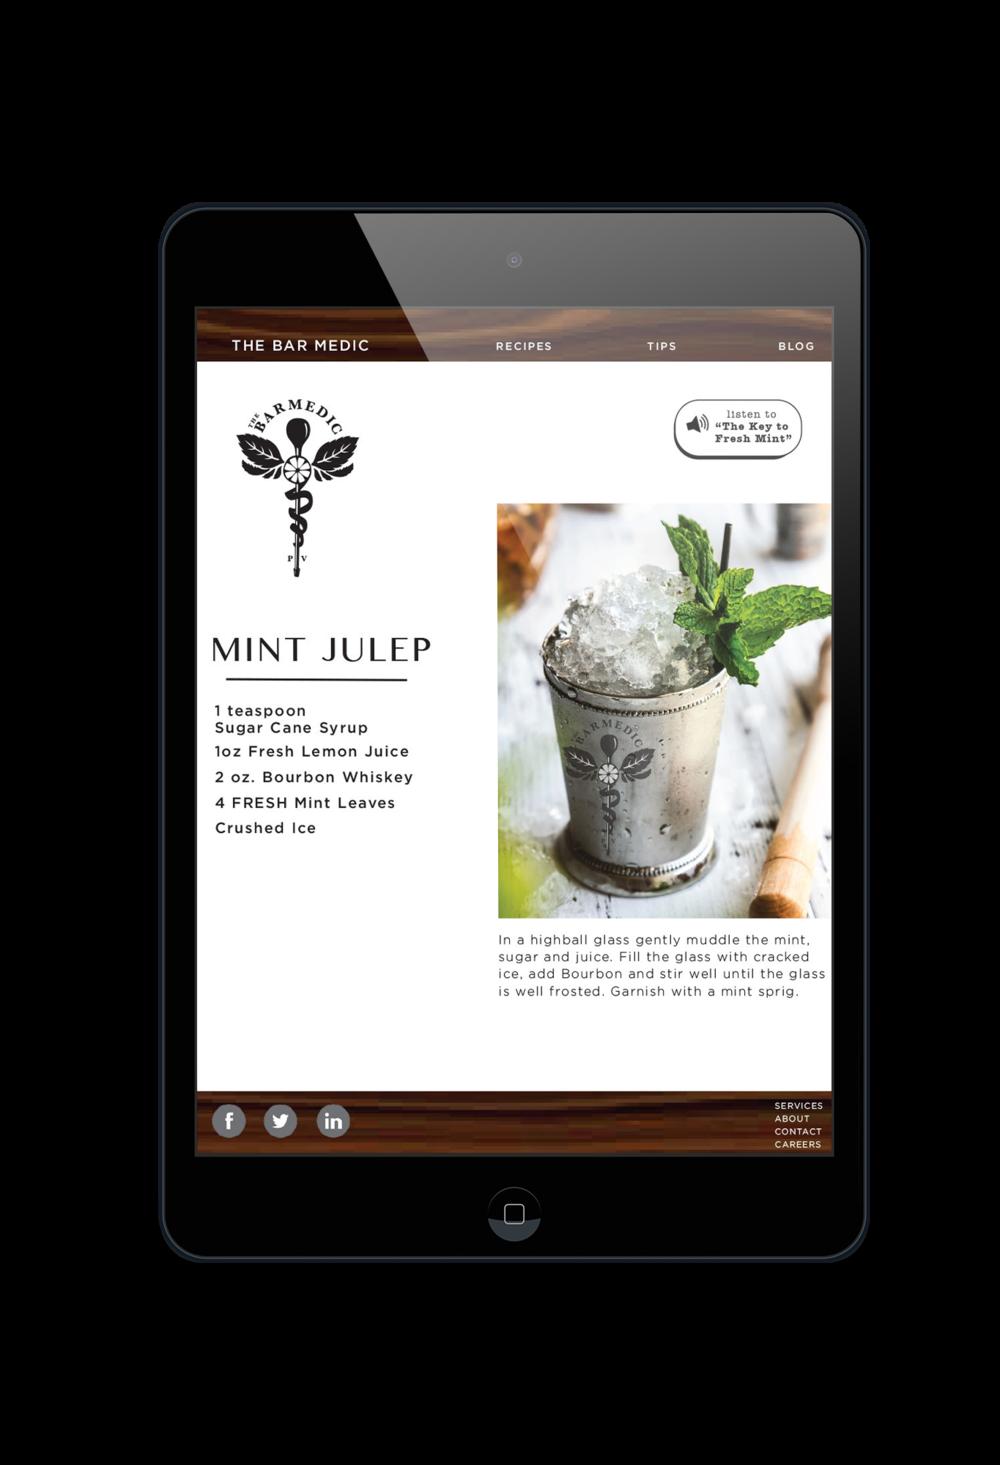 BarMedic_recipe_tablet_2.png